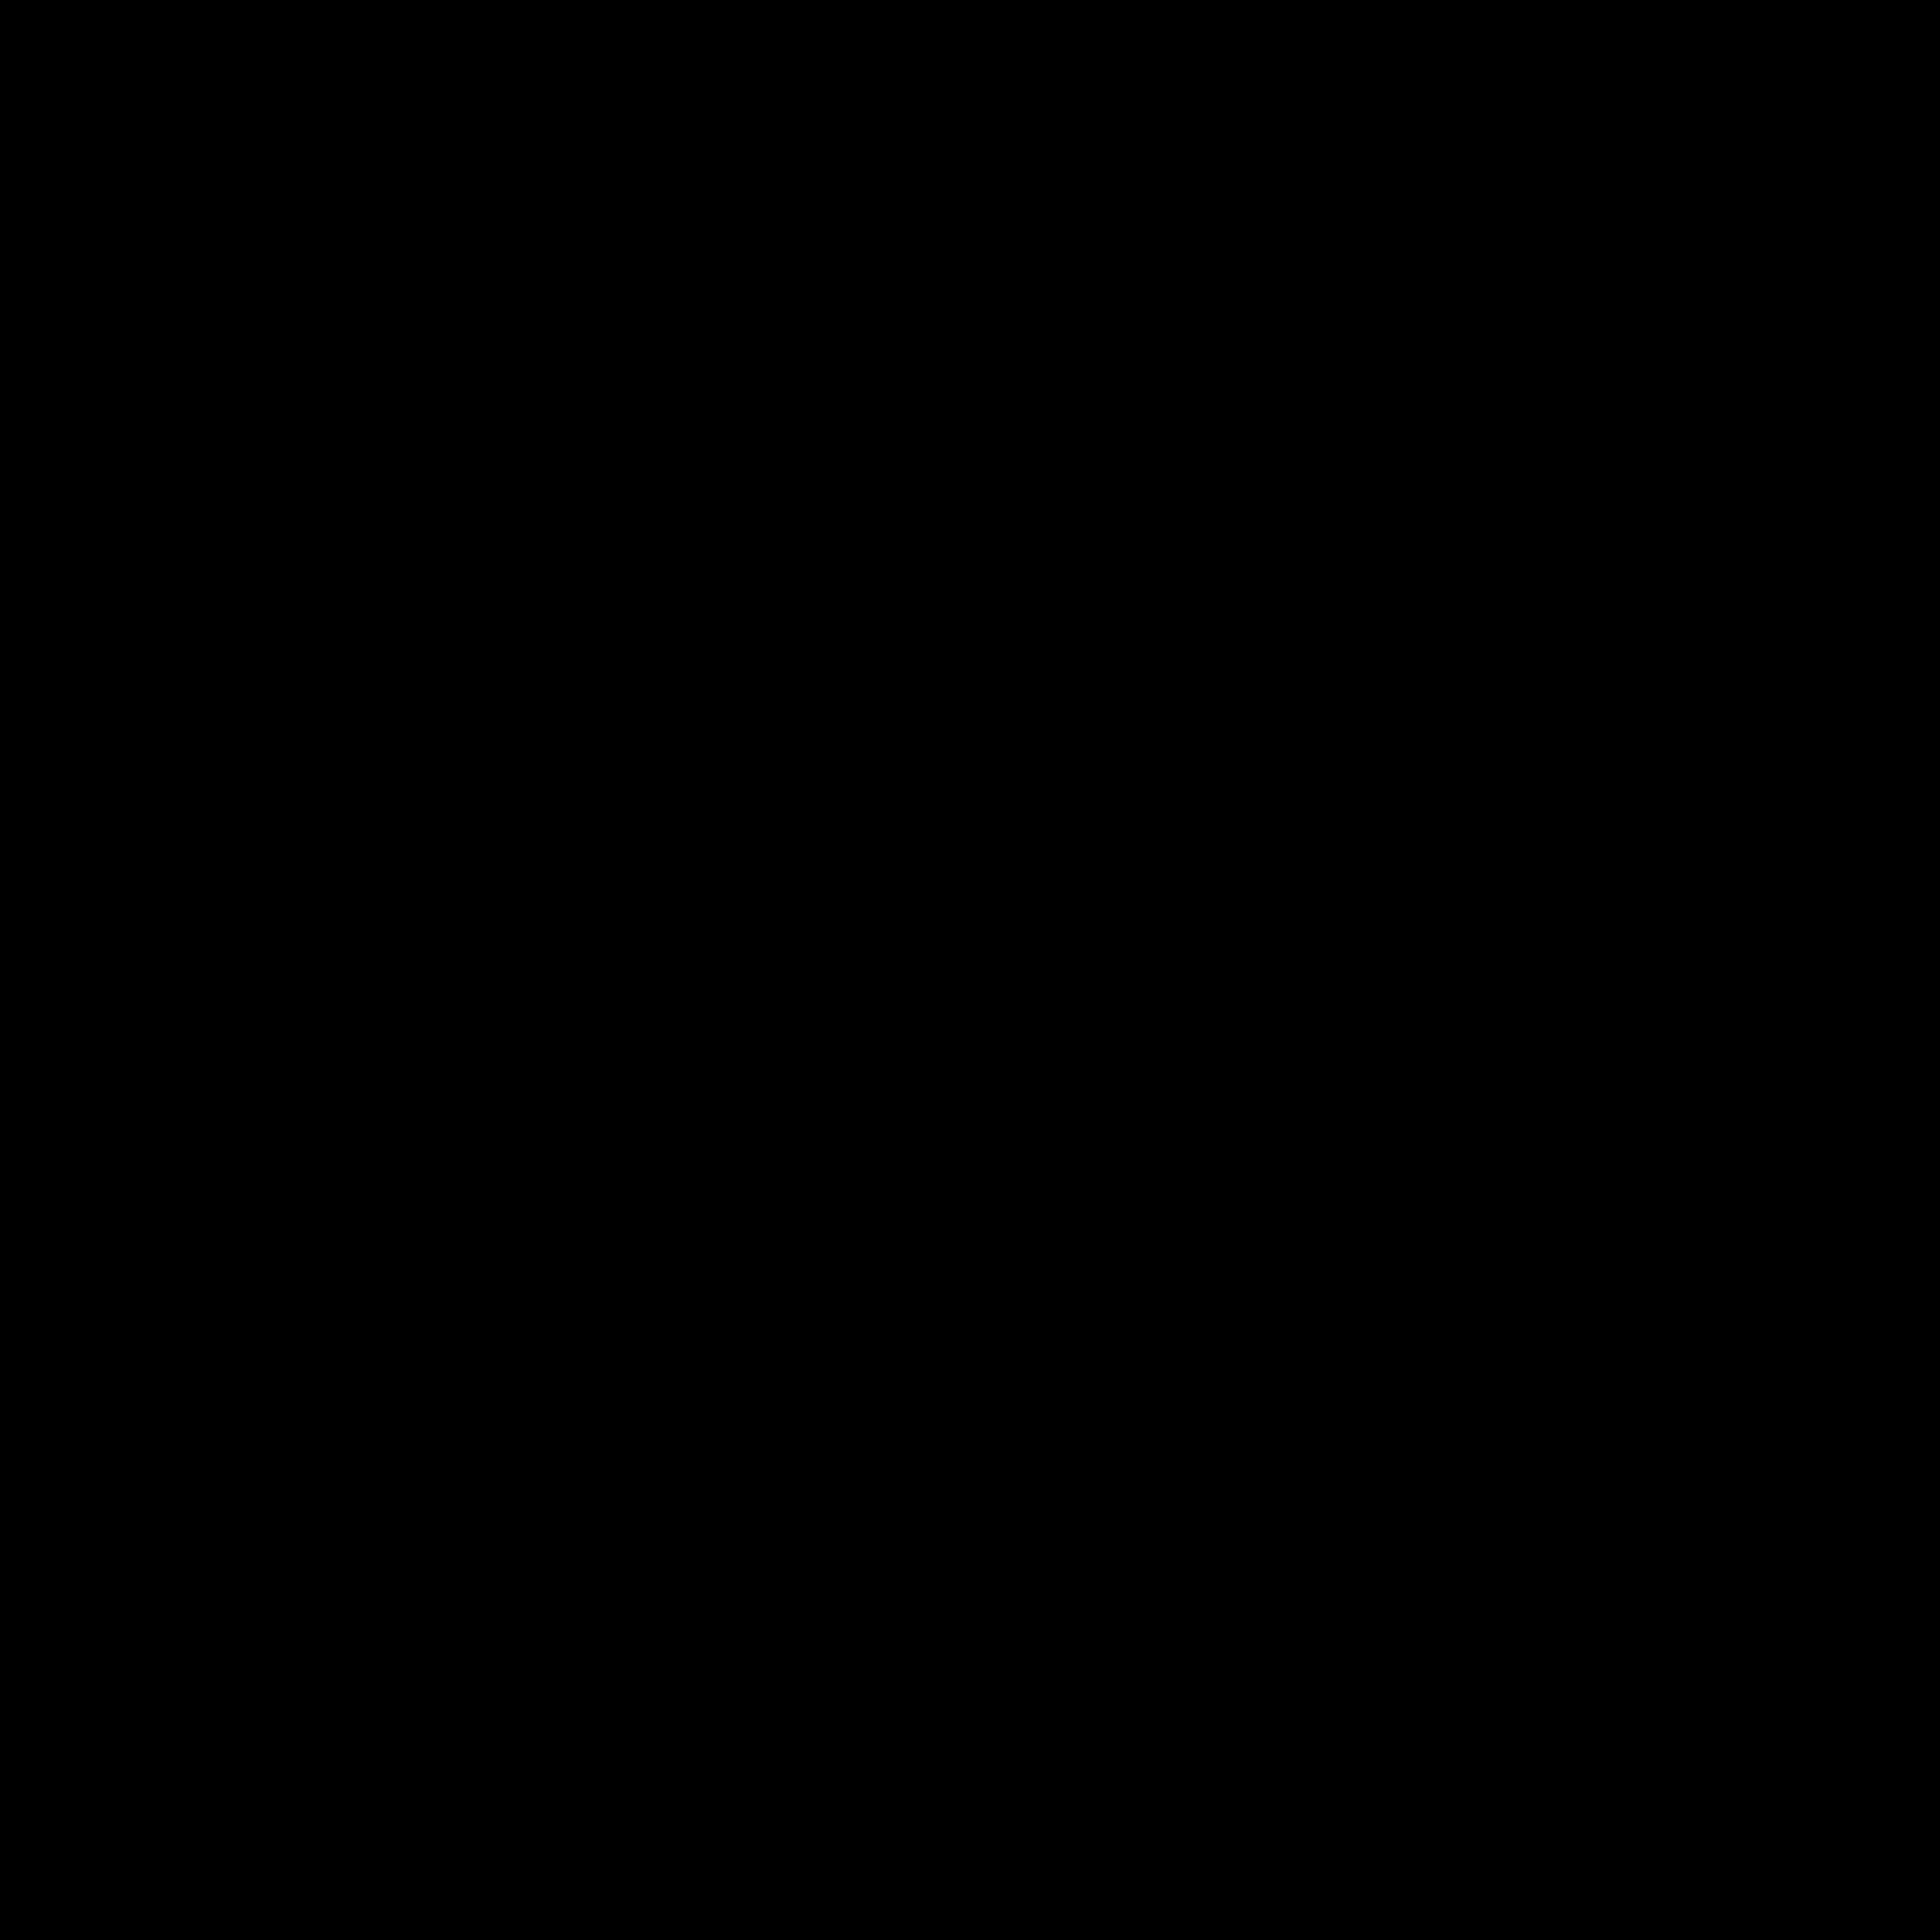 trd racing development logo png transparent amp svg vector